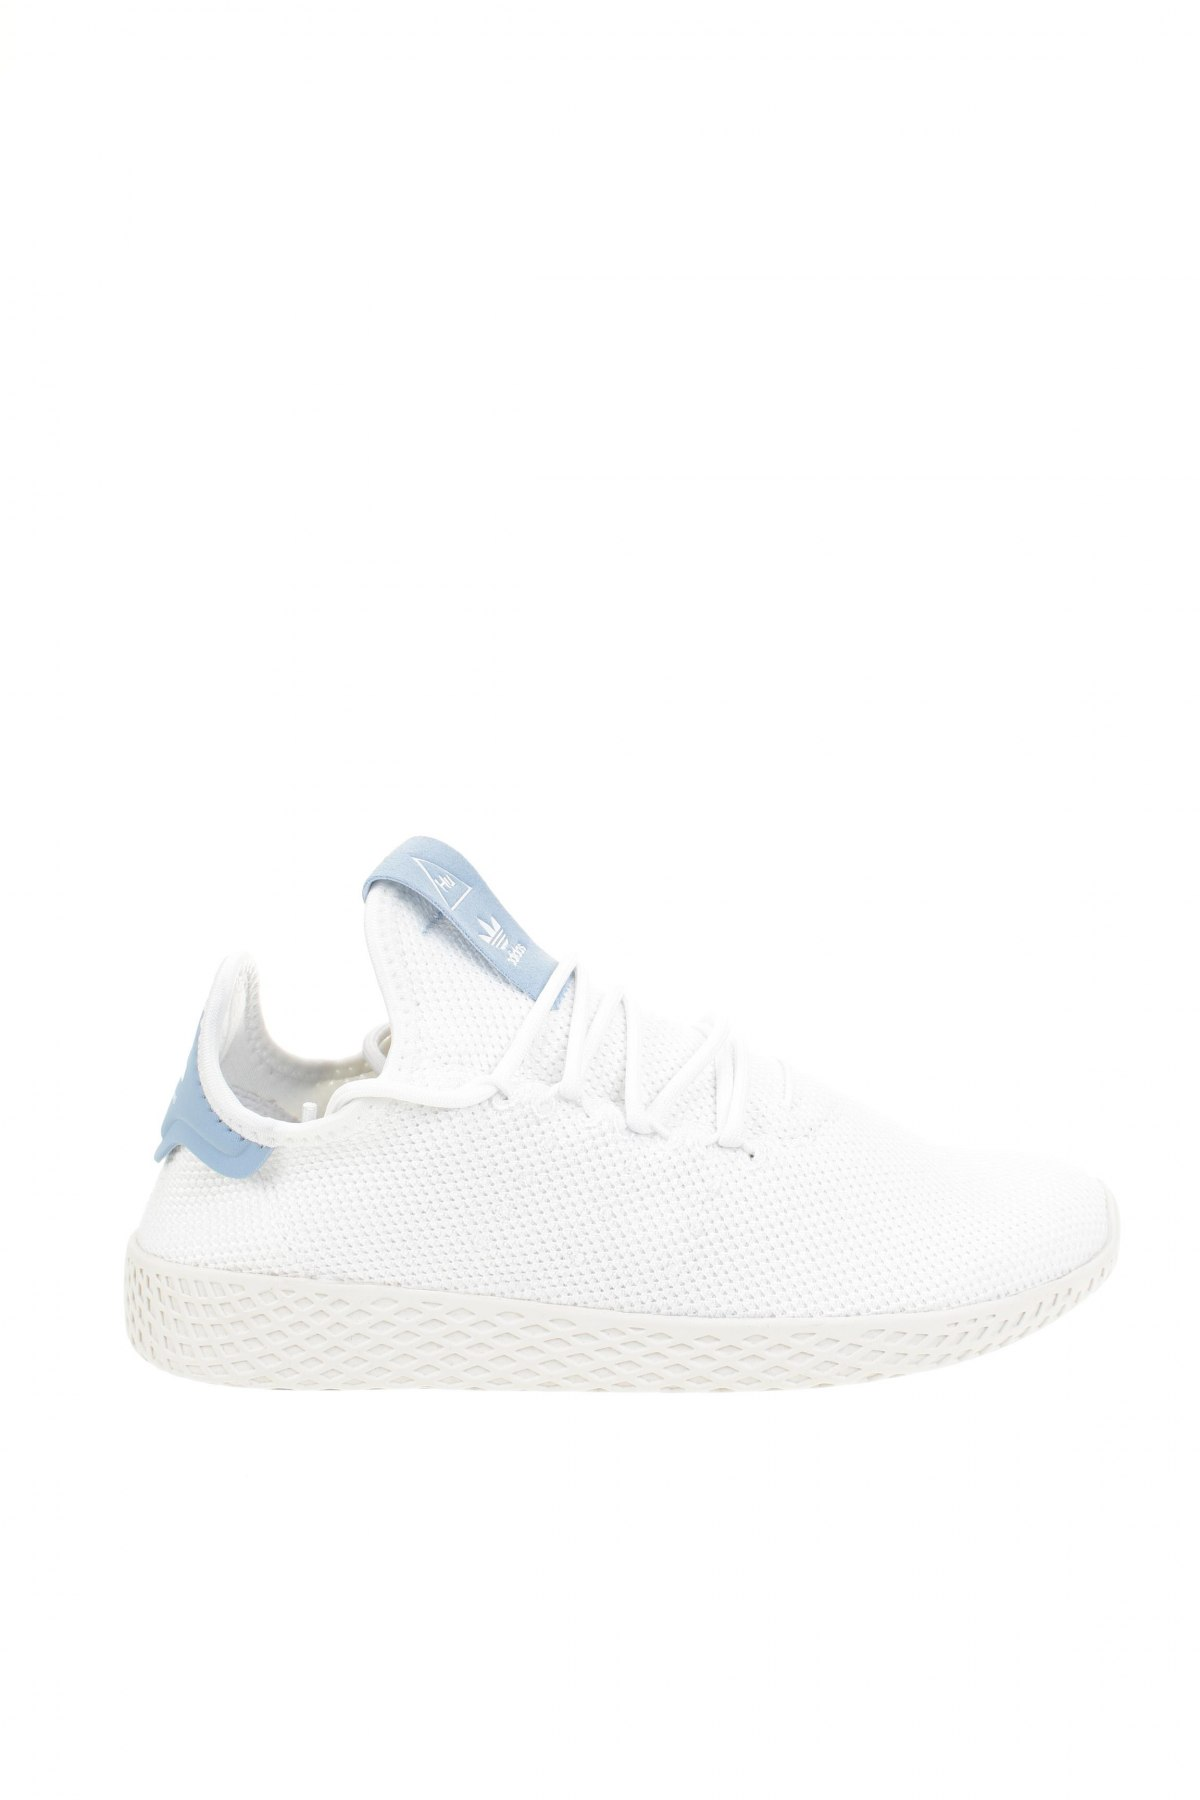 51309bb1636f Damenschuhe Adidas Originals Pharrell Williams Tennis Hu - günstig ...